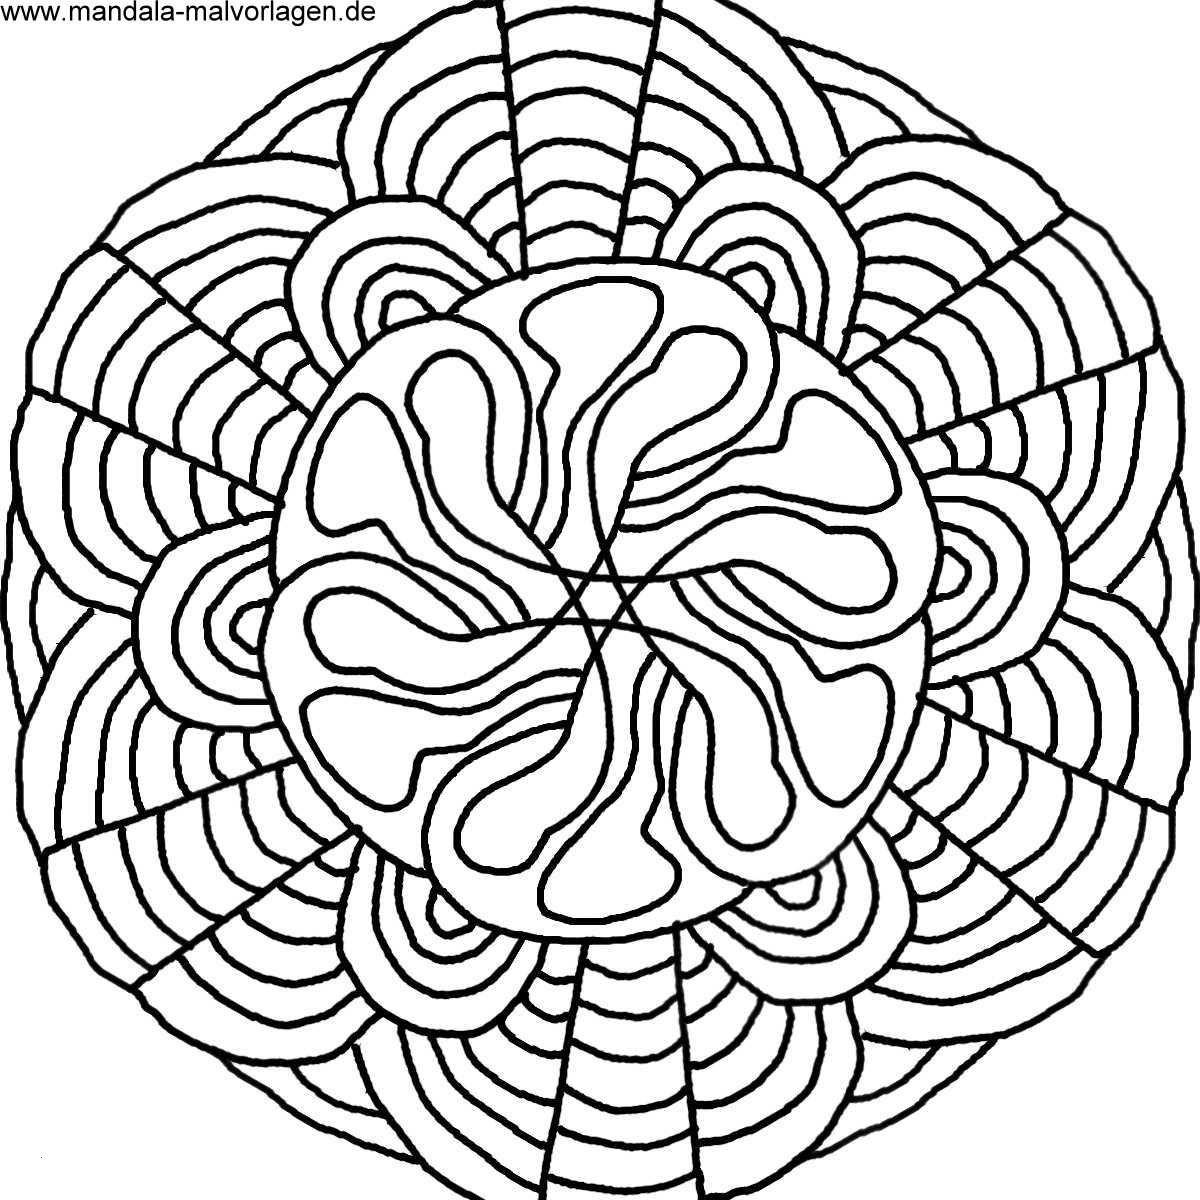 Mandala Zum Ausdrucken Rosen Einzigartig 40 Ausmalbilder Rosen Scoredatscore Genial Ausmalbilder Rosen Das Bild